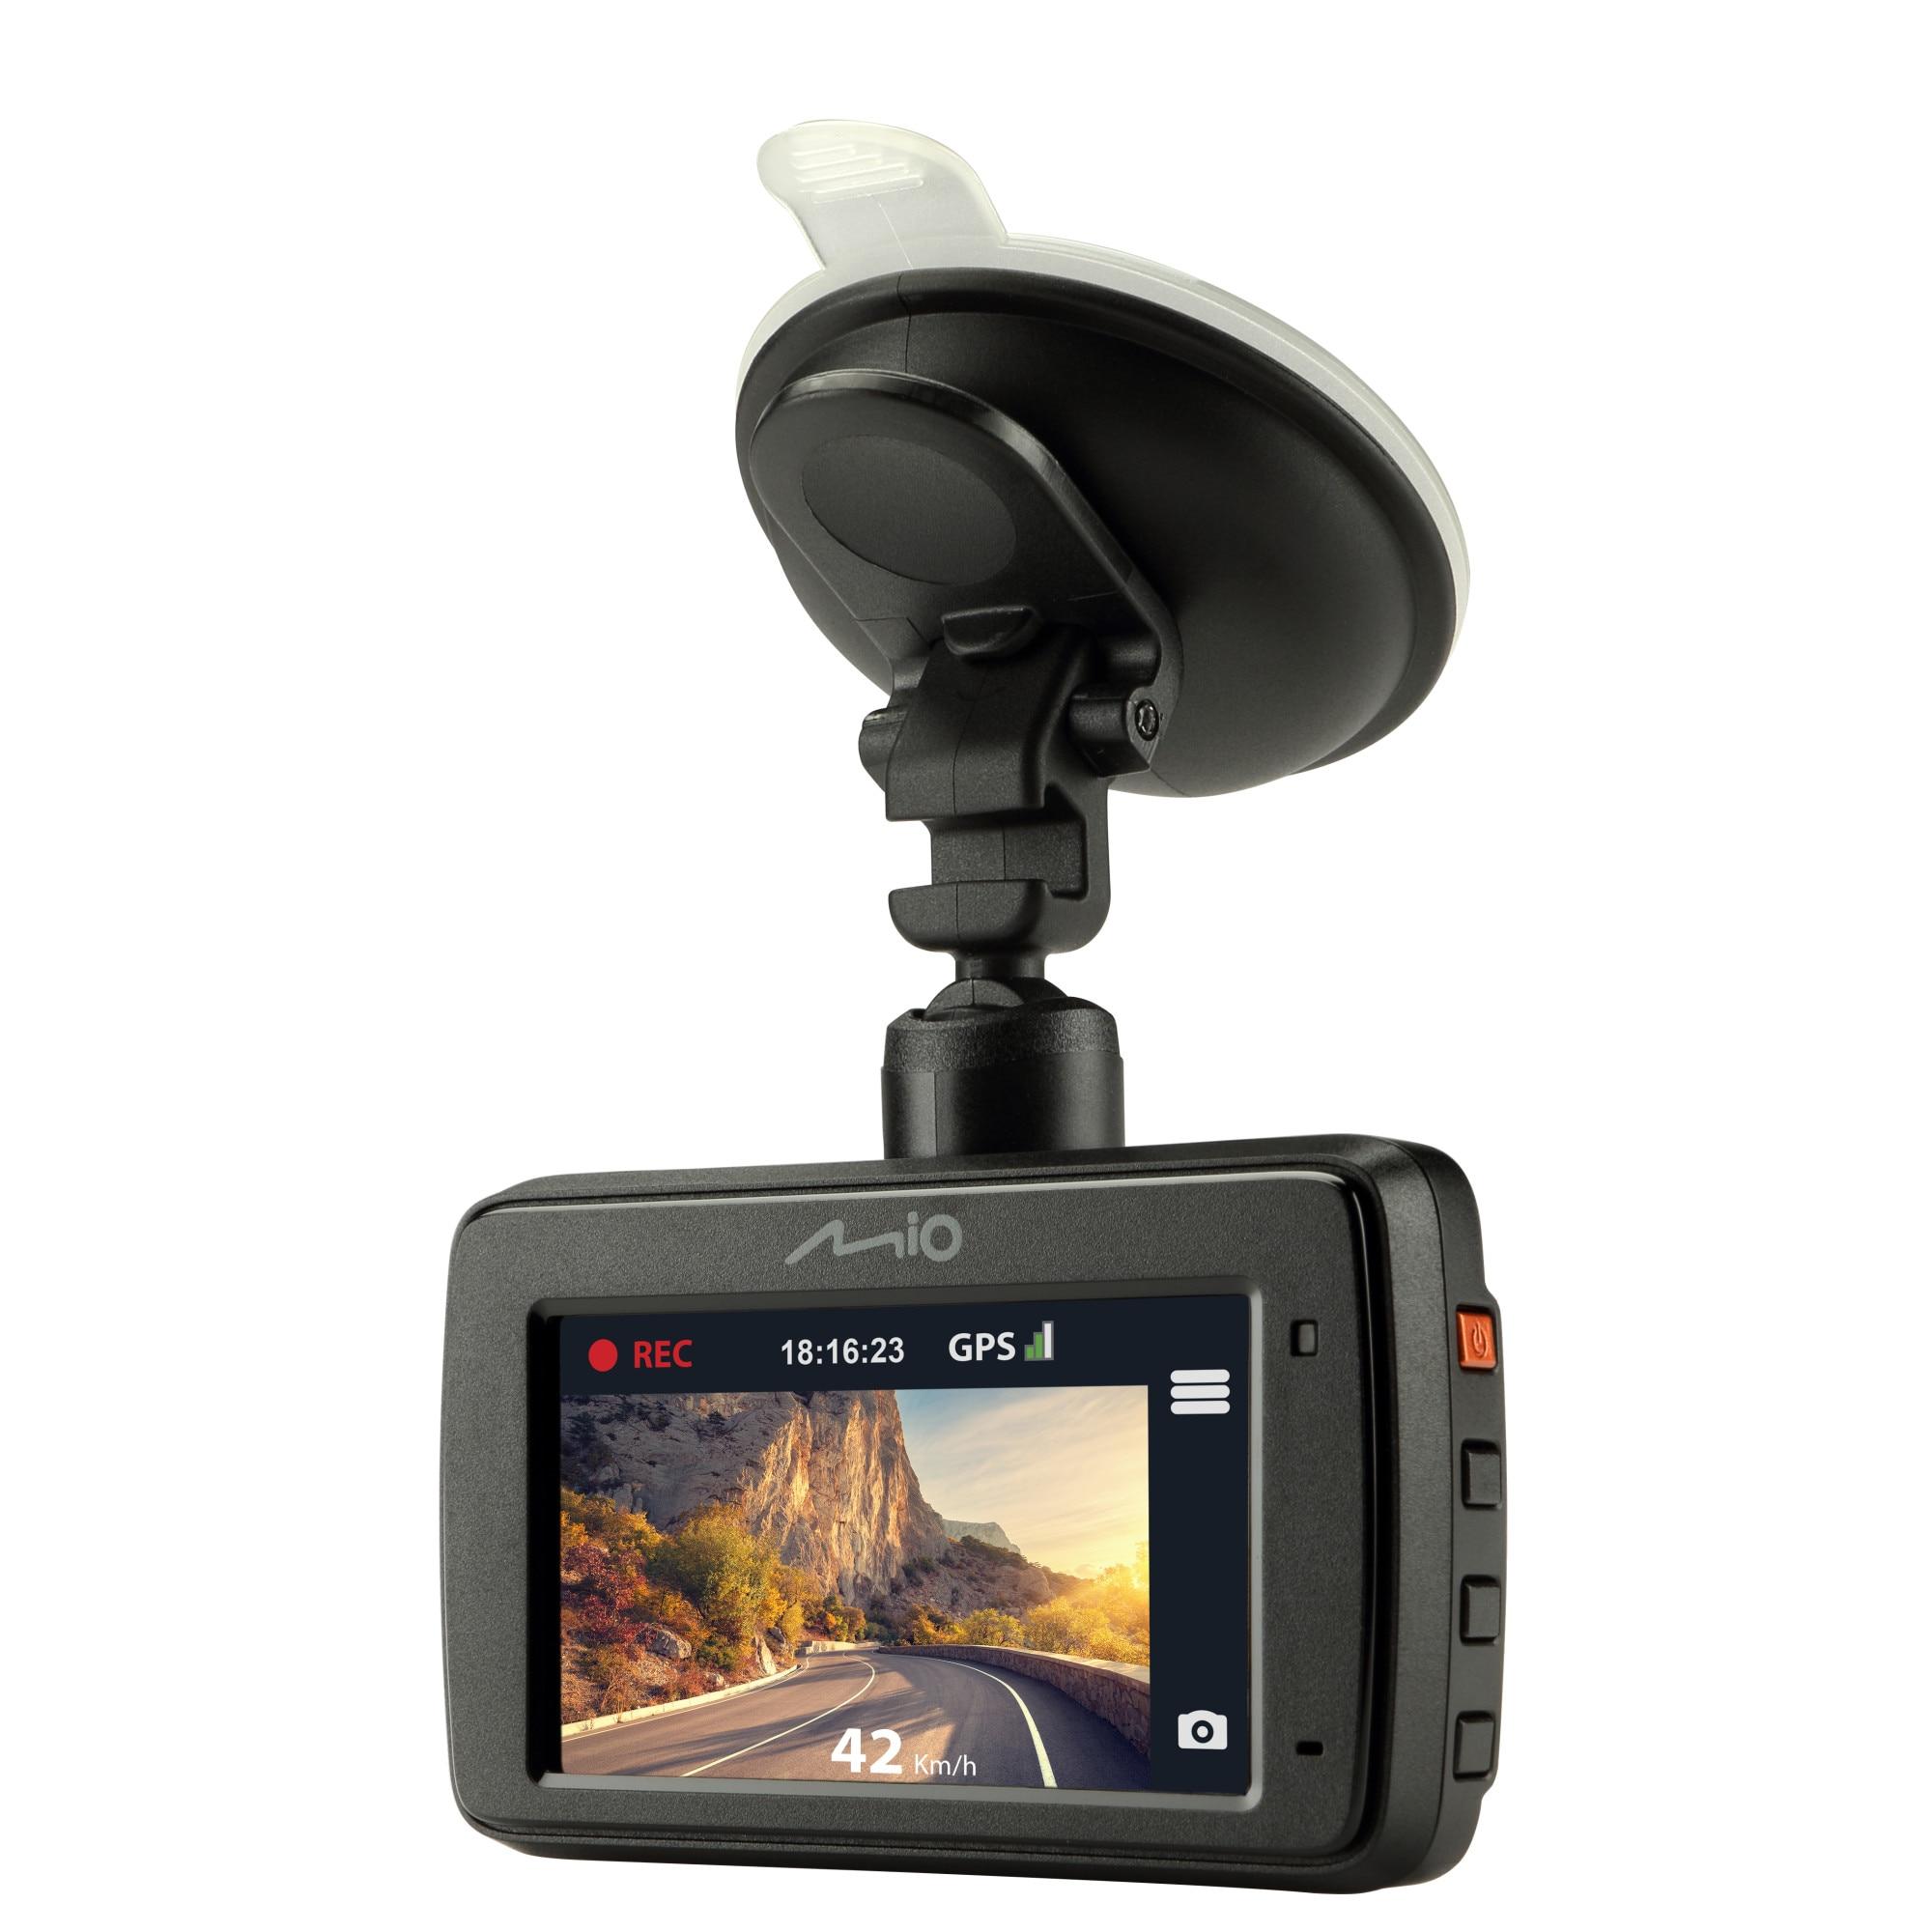 "Fotografie Camera auto DVR Mio MiVue731, Full HD, ecran 2.7"", GPS integrat, unghi 130 de grade, sistem de avertizare LDWS"